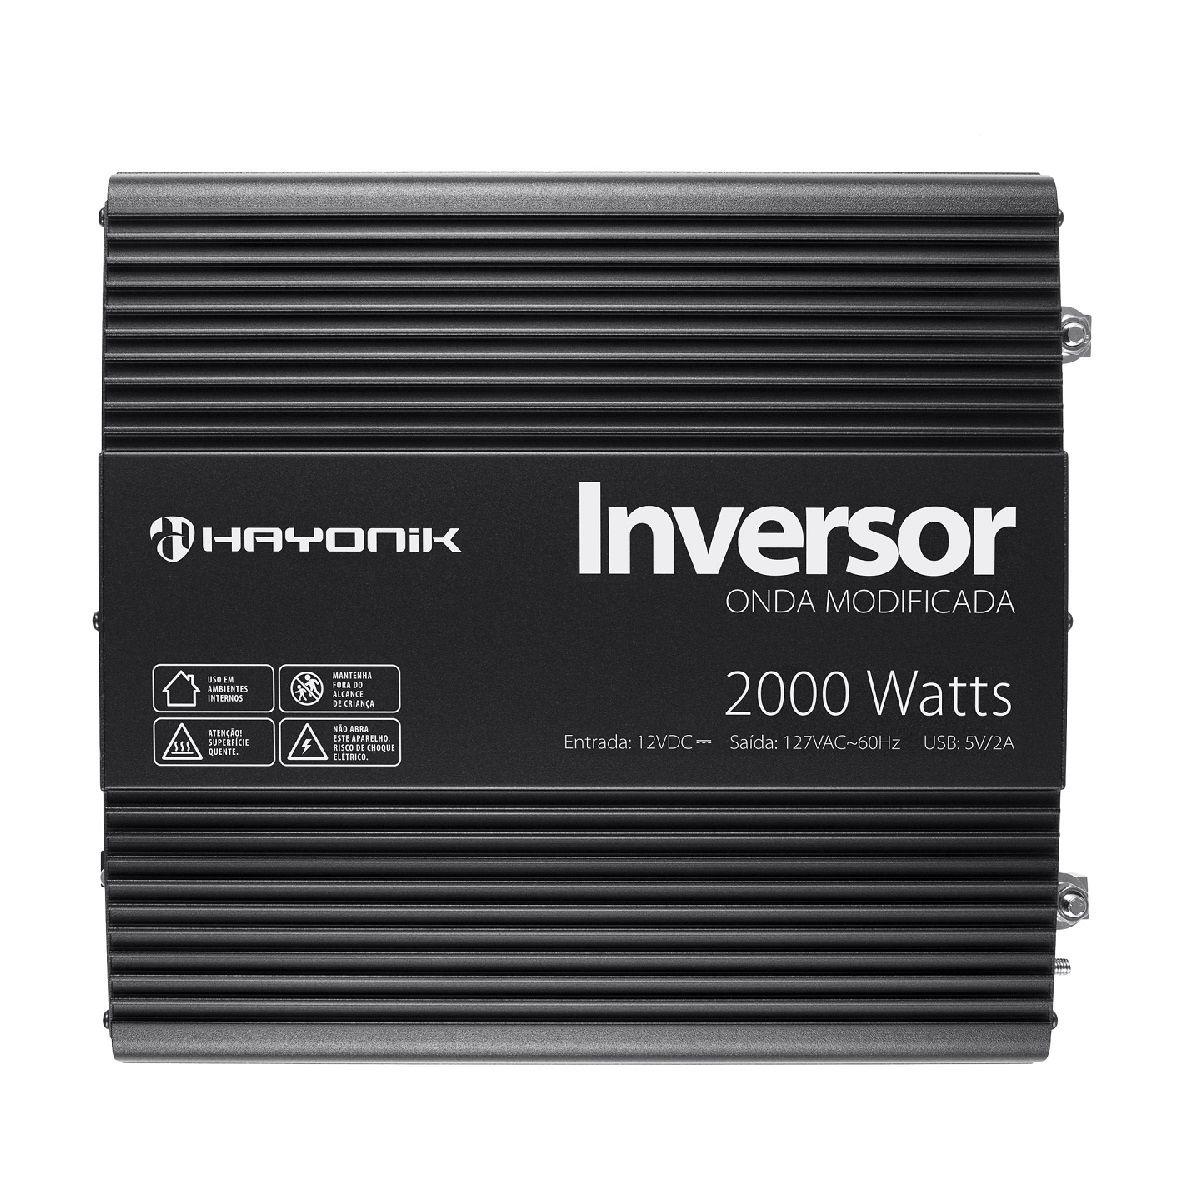 Inversor de Onda Modificada 2000W 12VDC 220V - PW11-5